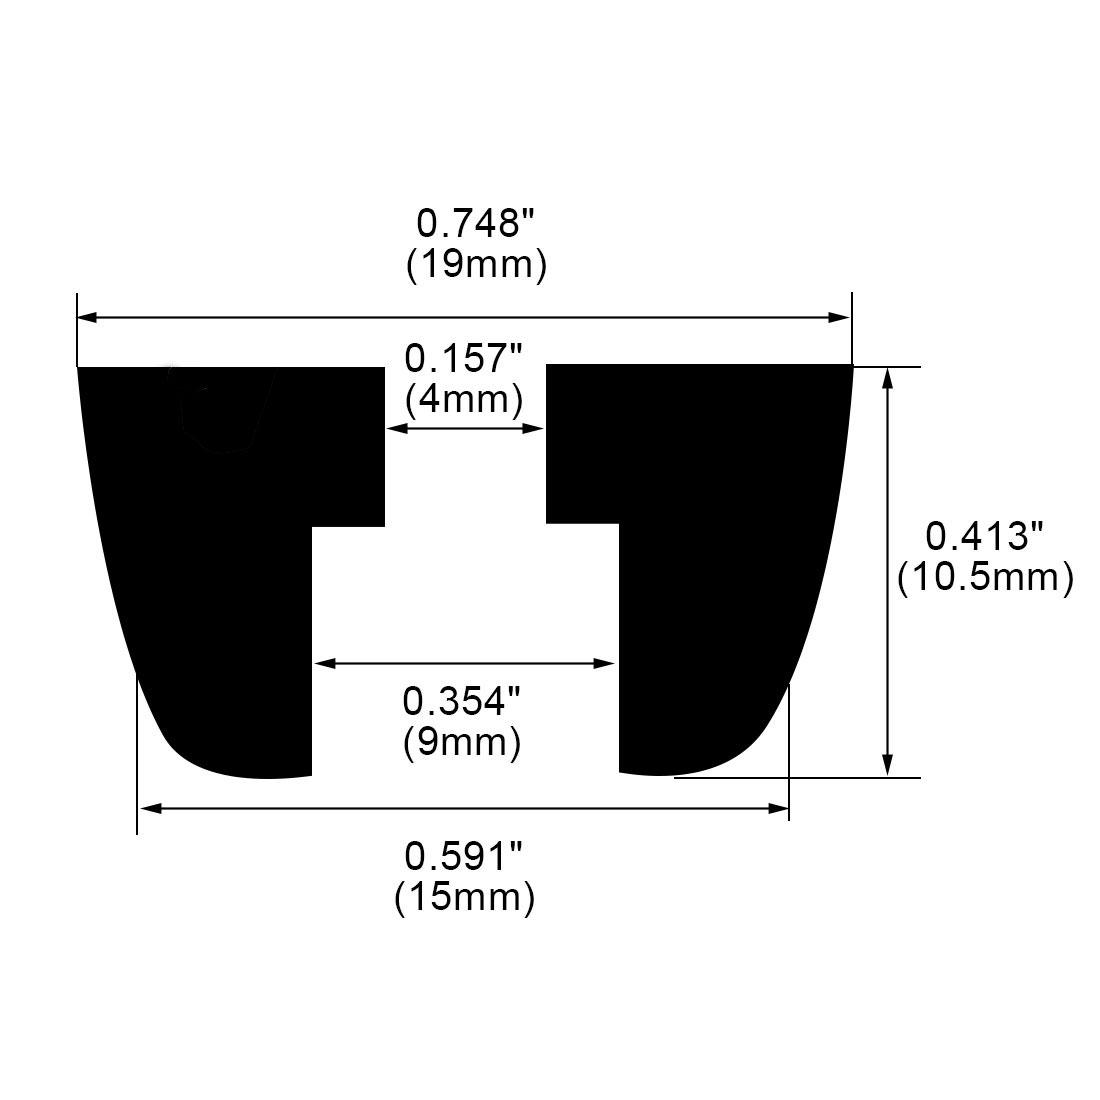 120pcs Rubber Feet Bumpers Amplifier Speaker Desk Cabinet Leg Pads, D15x19xH10.5mm - image 2 of 7